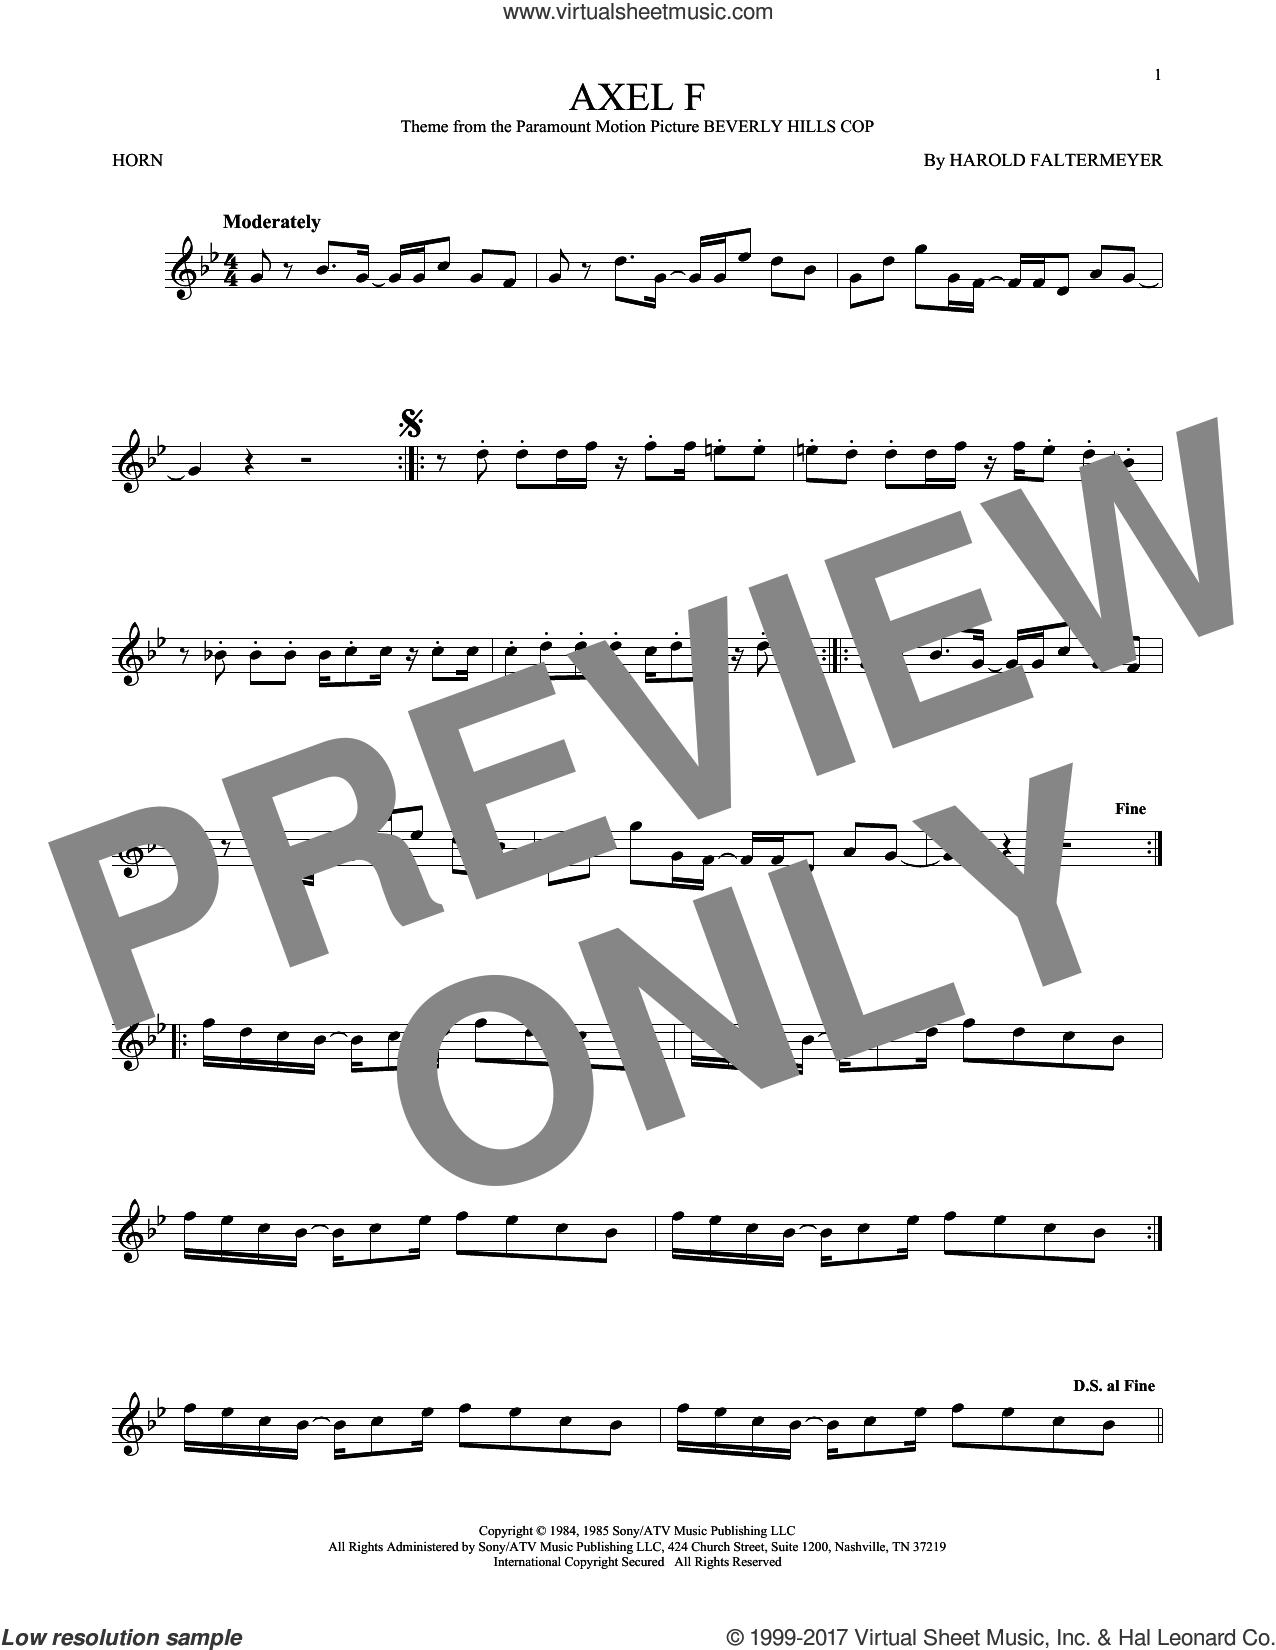 Axel F sheet music for horn solo by Harold Faltermeyer, intermediate skill level